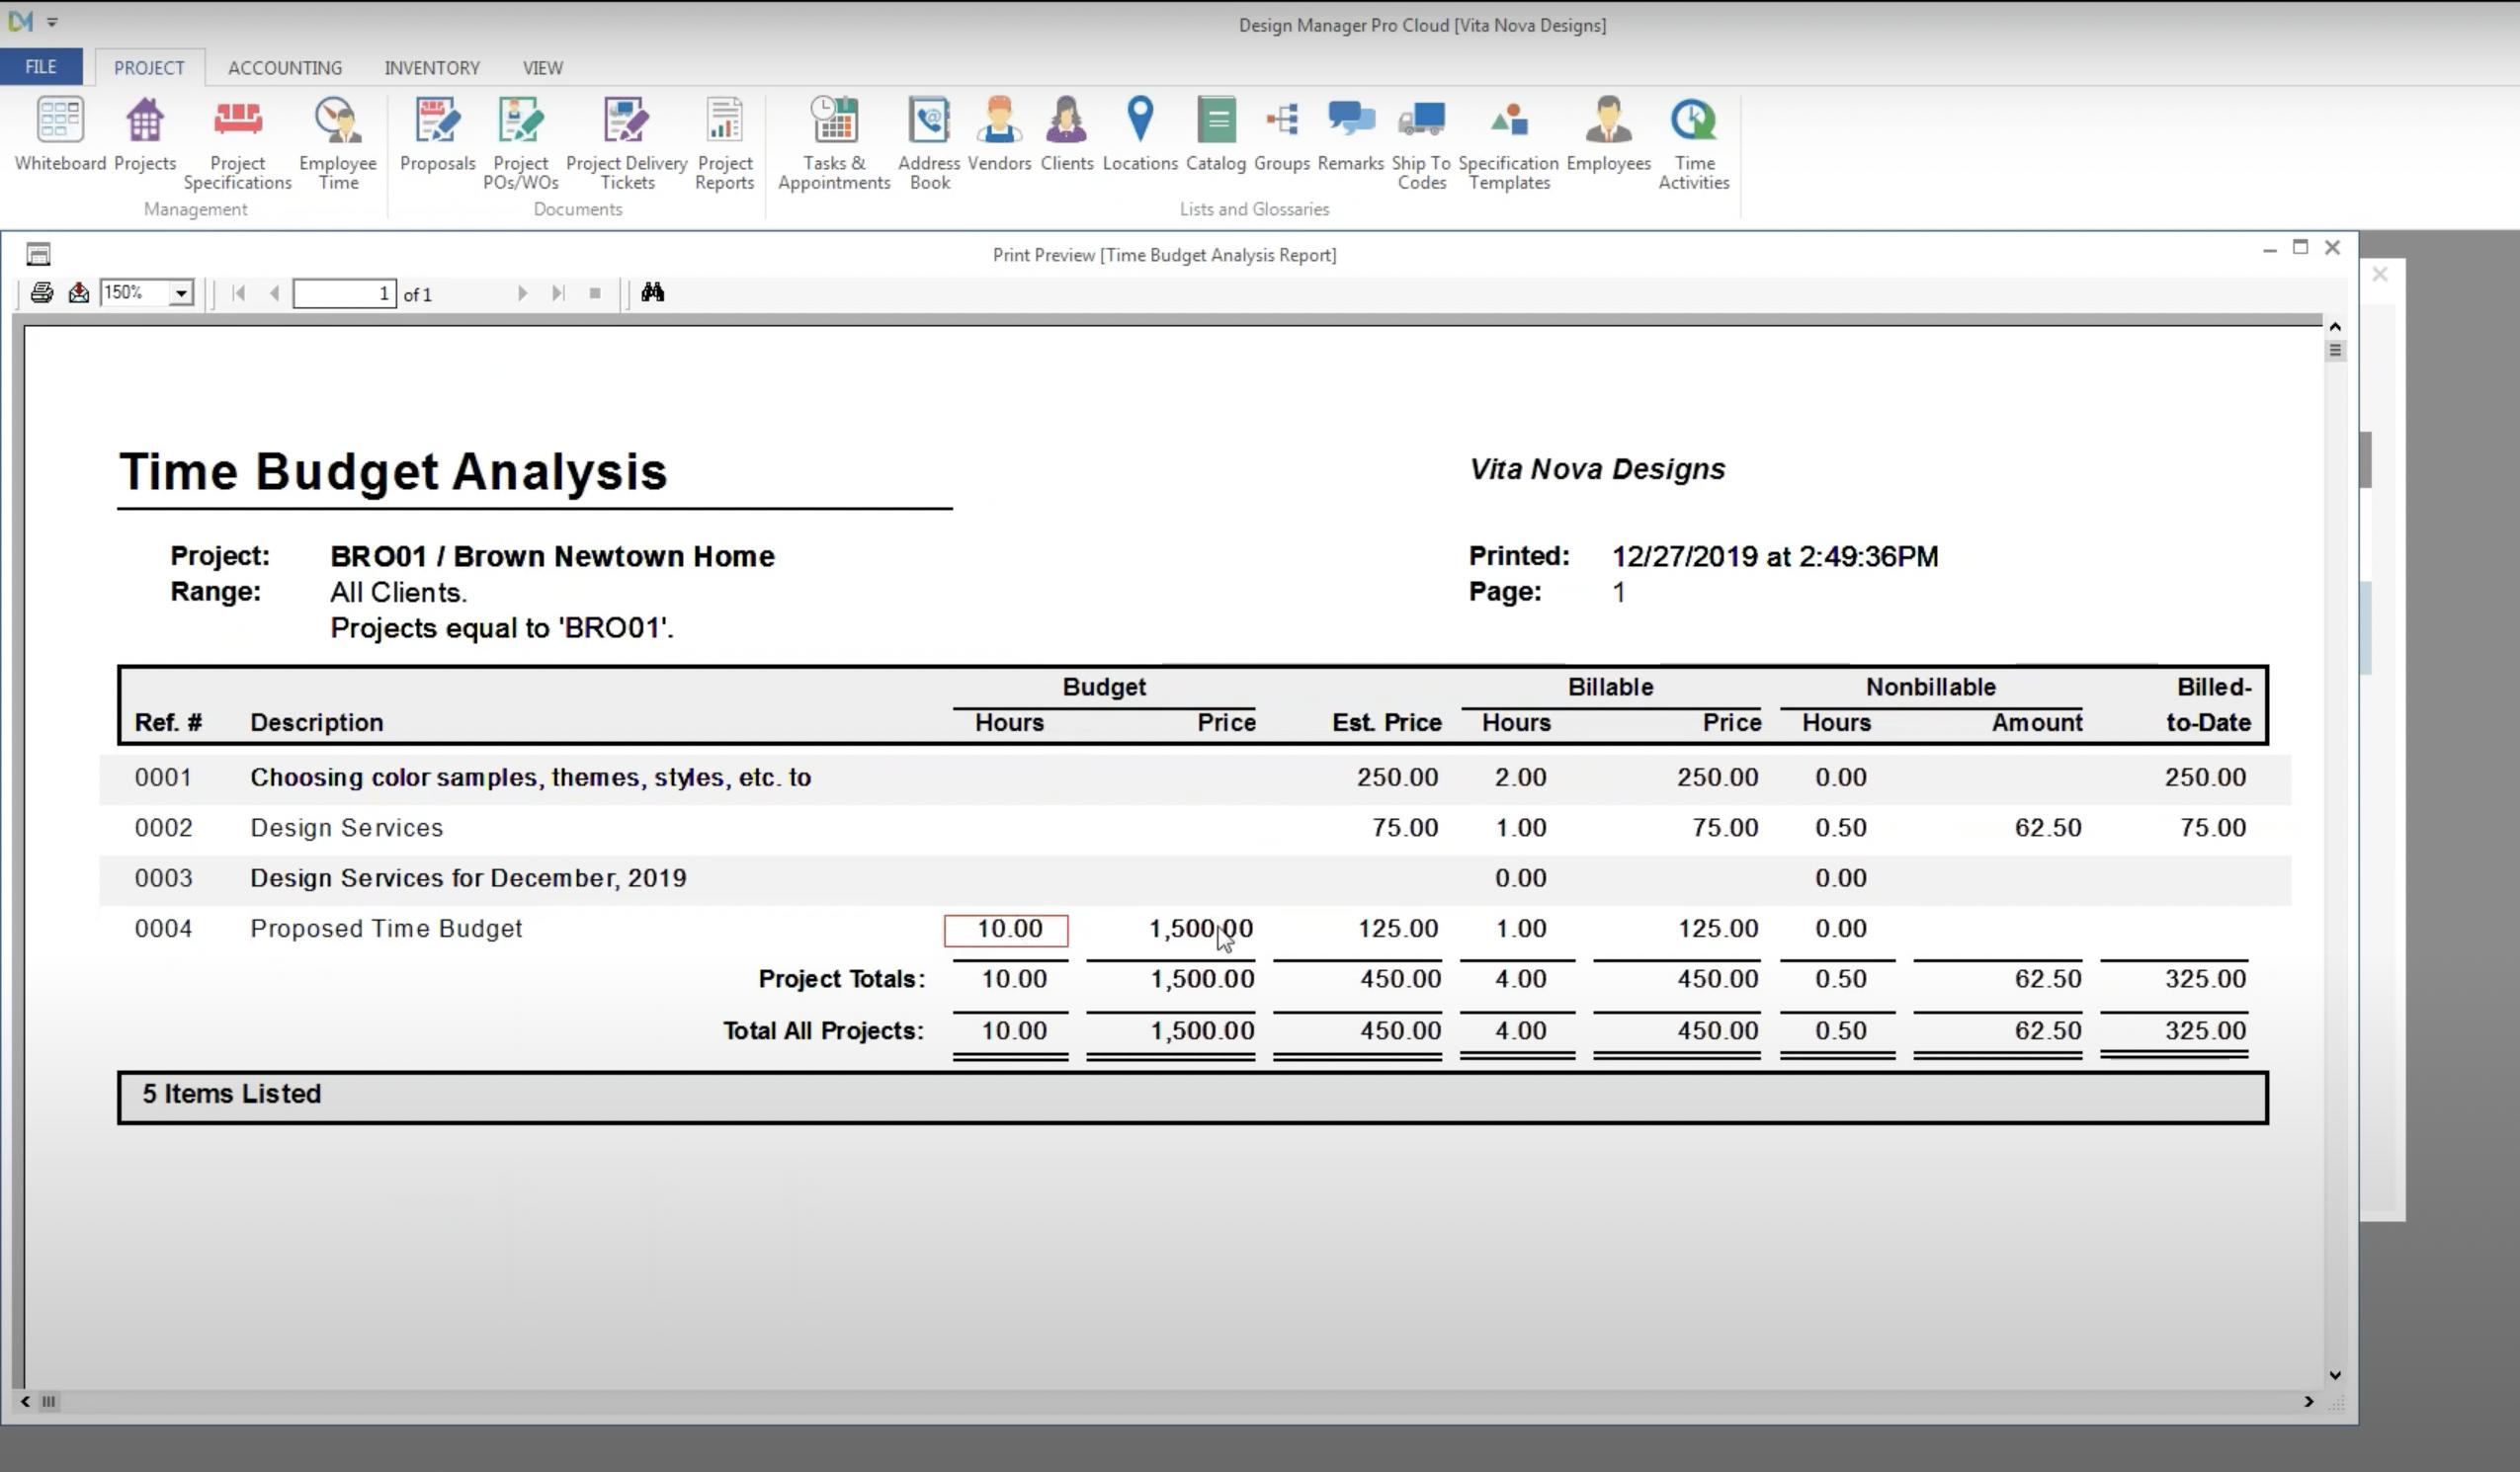 Time Budget Analysis